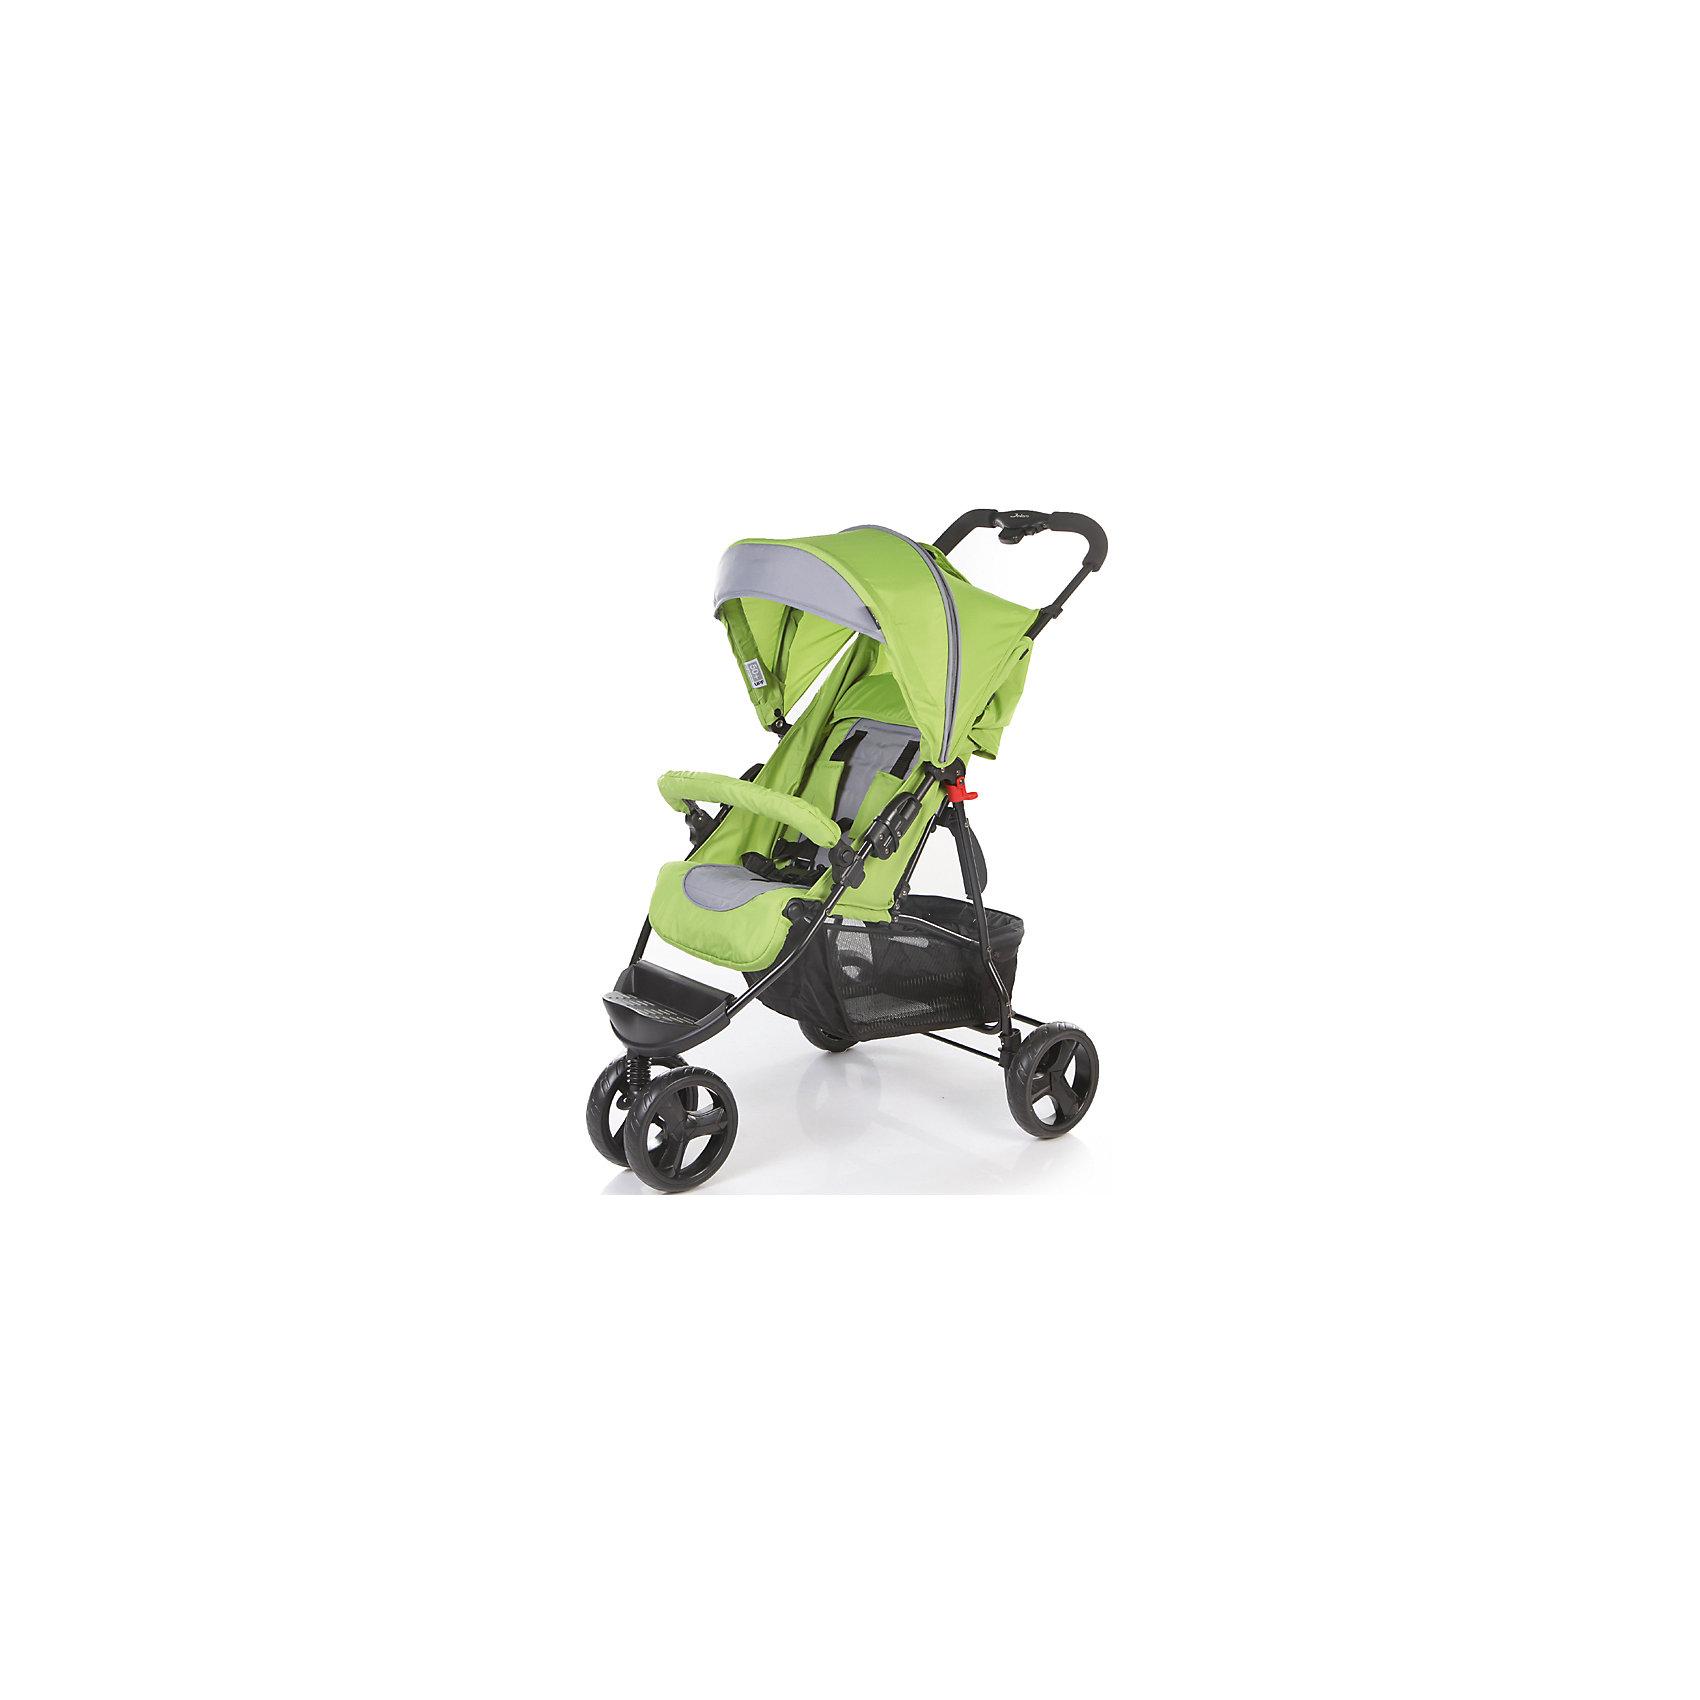 Прогулочная коляска Jetem Mira Lite, зелёный/тёмно-серый